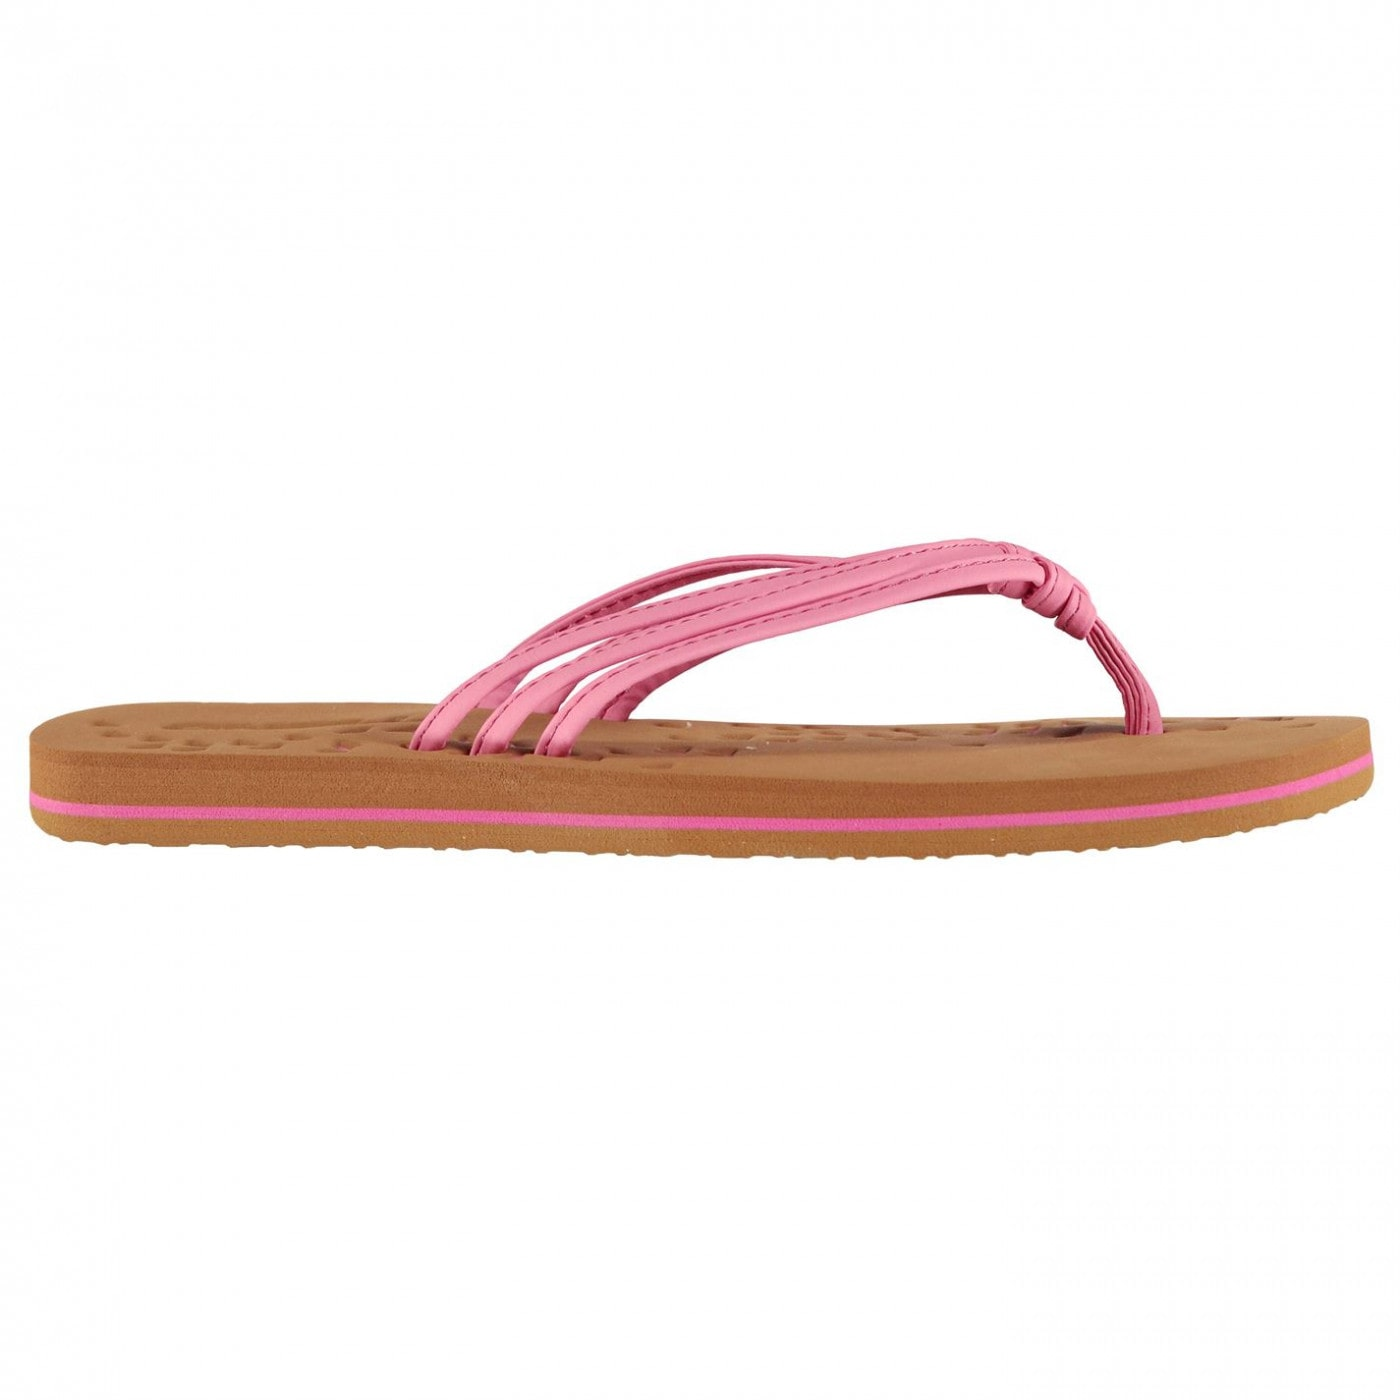 ONeill Ditsy Flip Flops Junior Girls